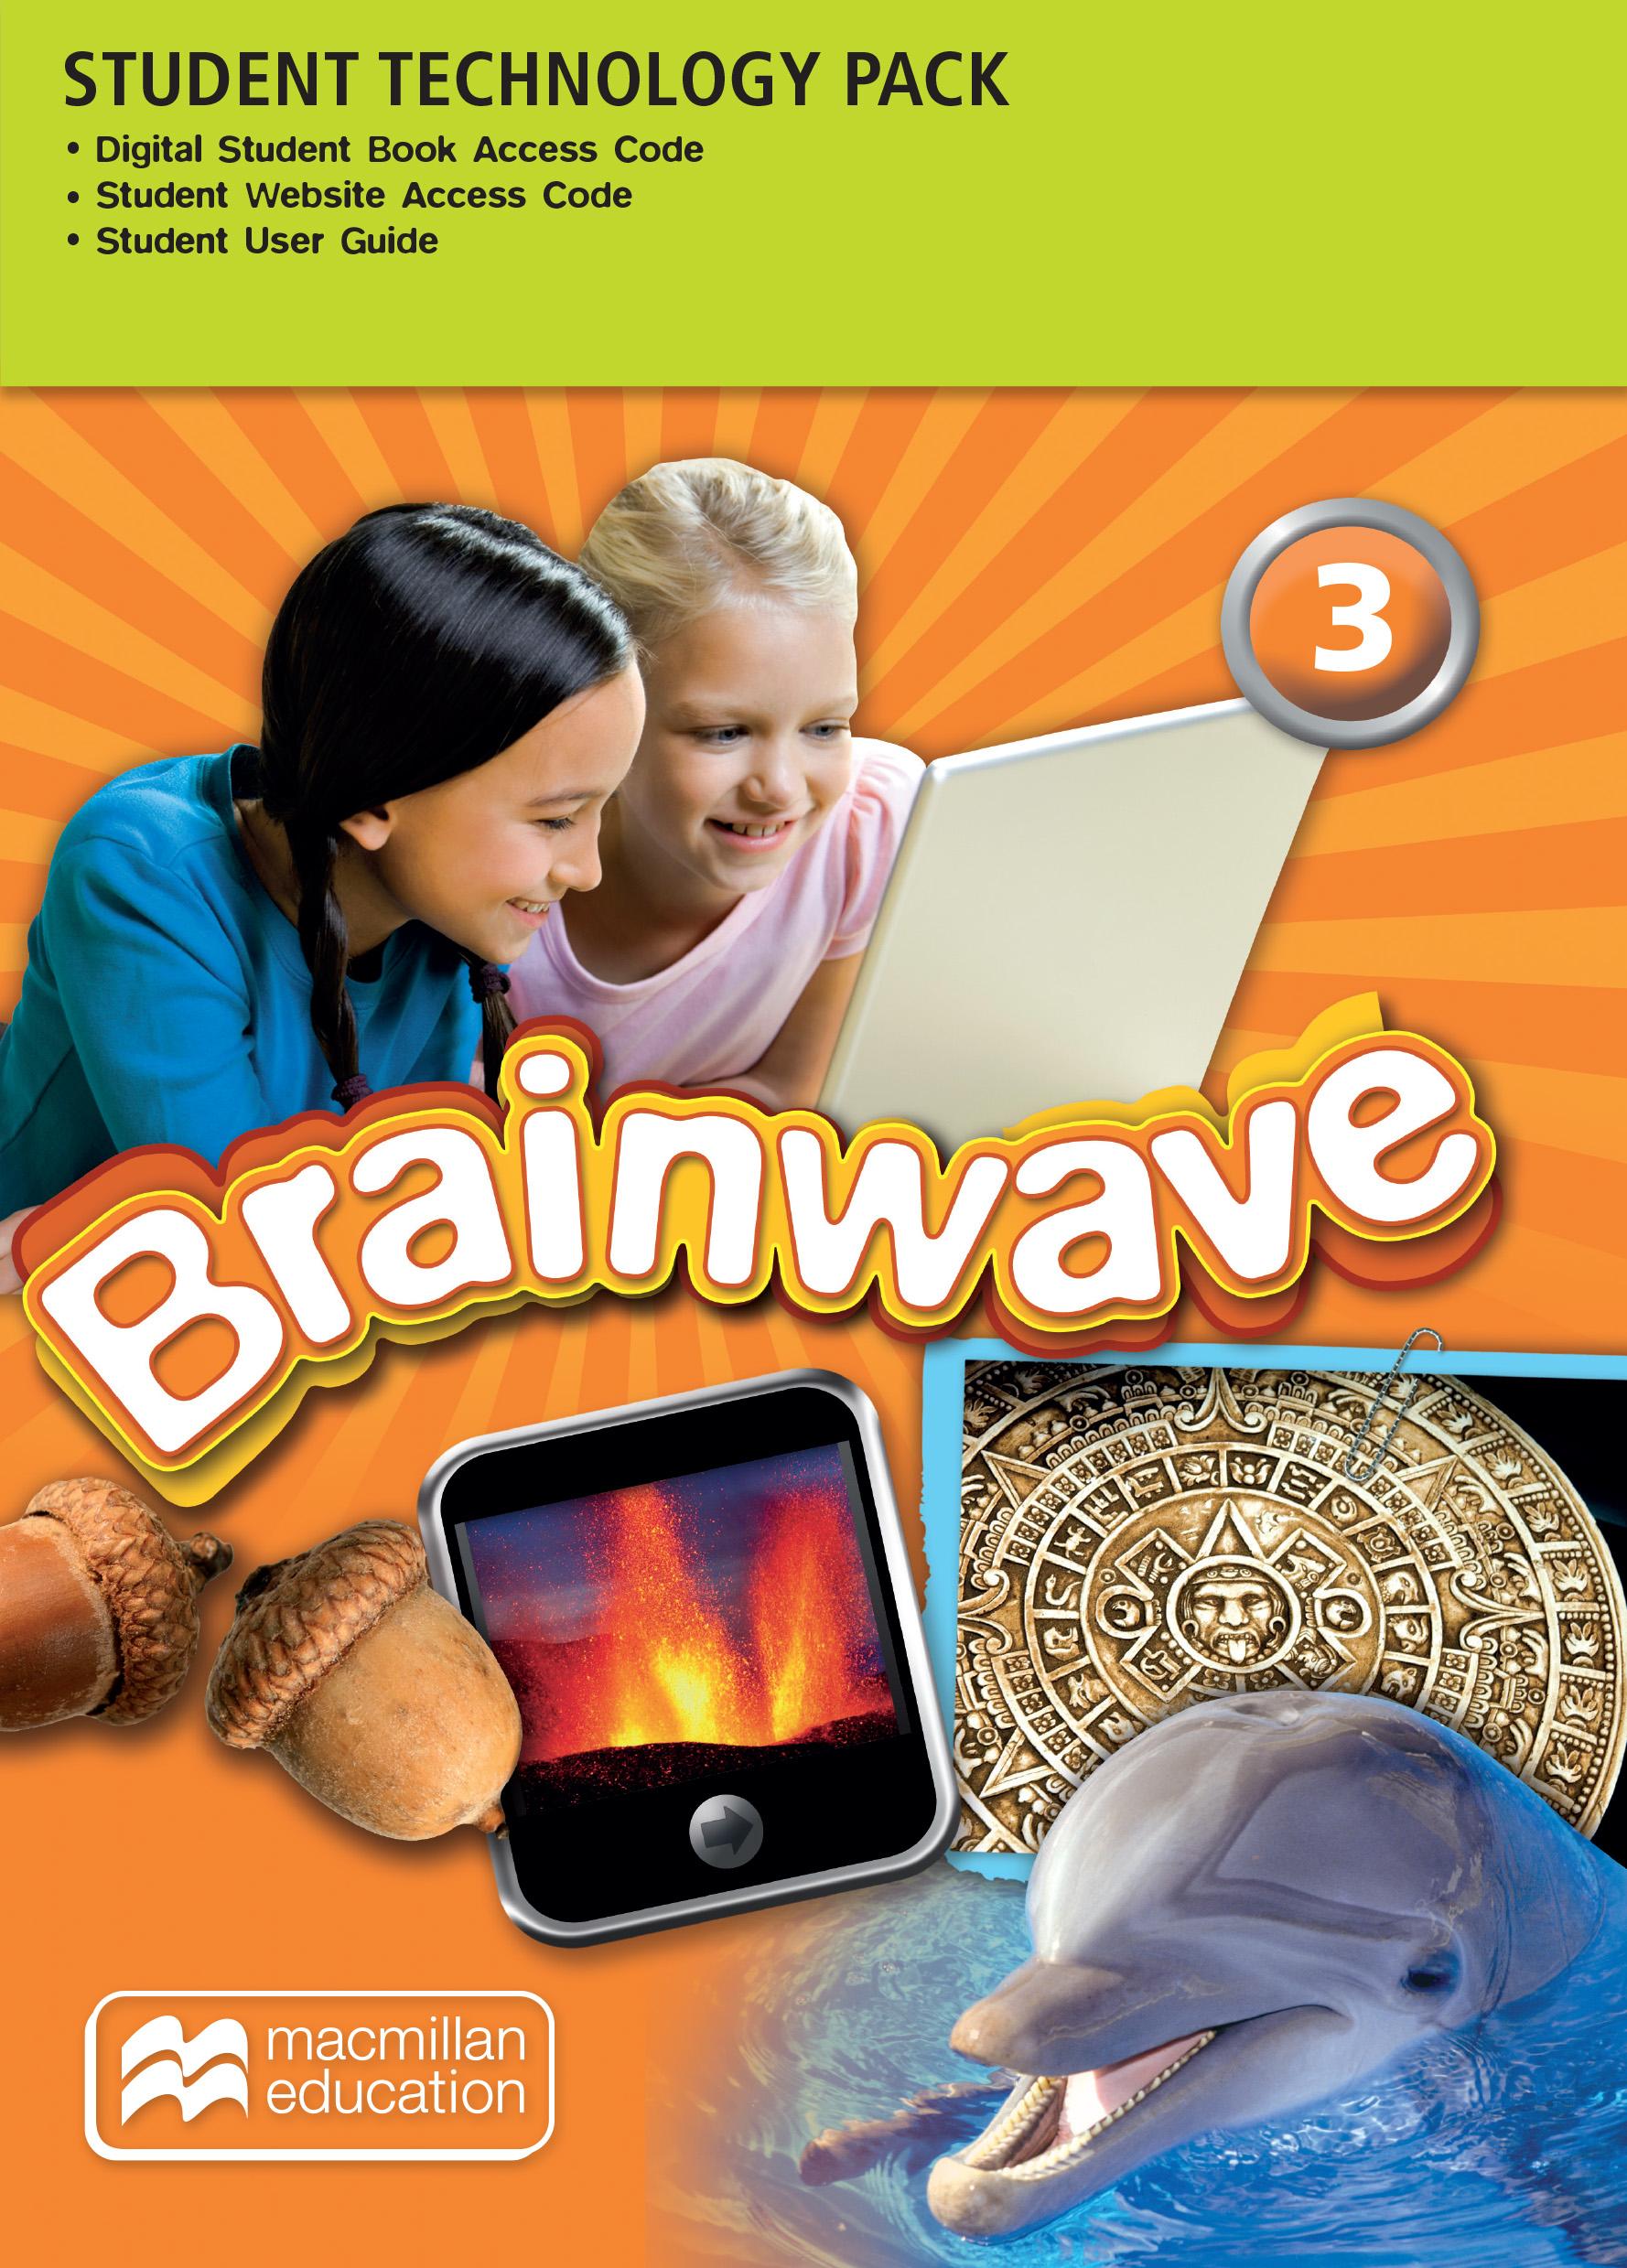 Brainwave 3 Student Technology Pack